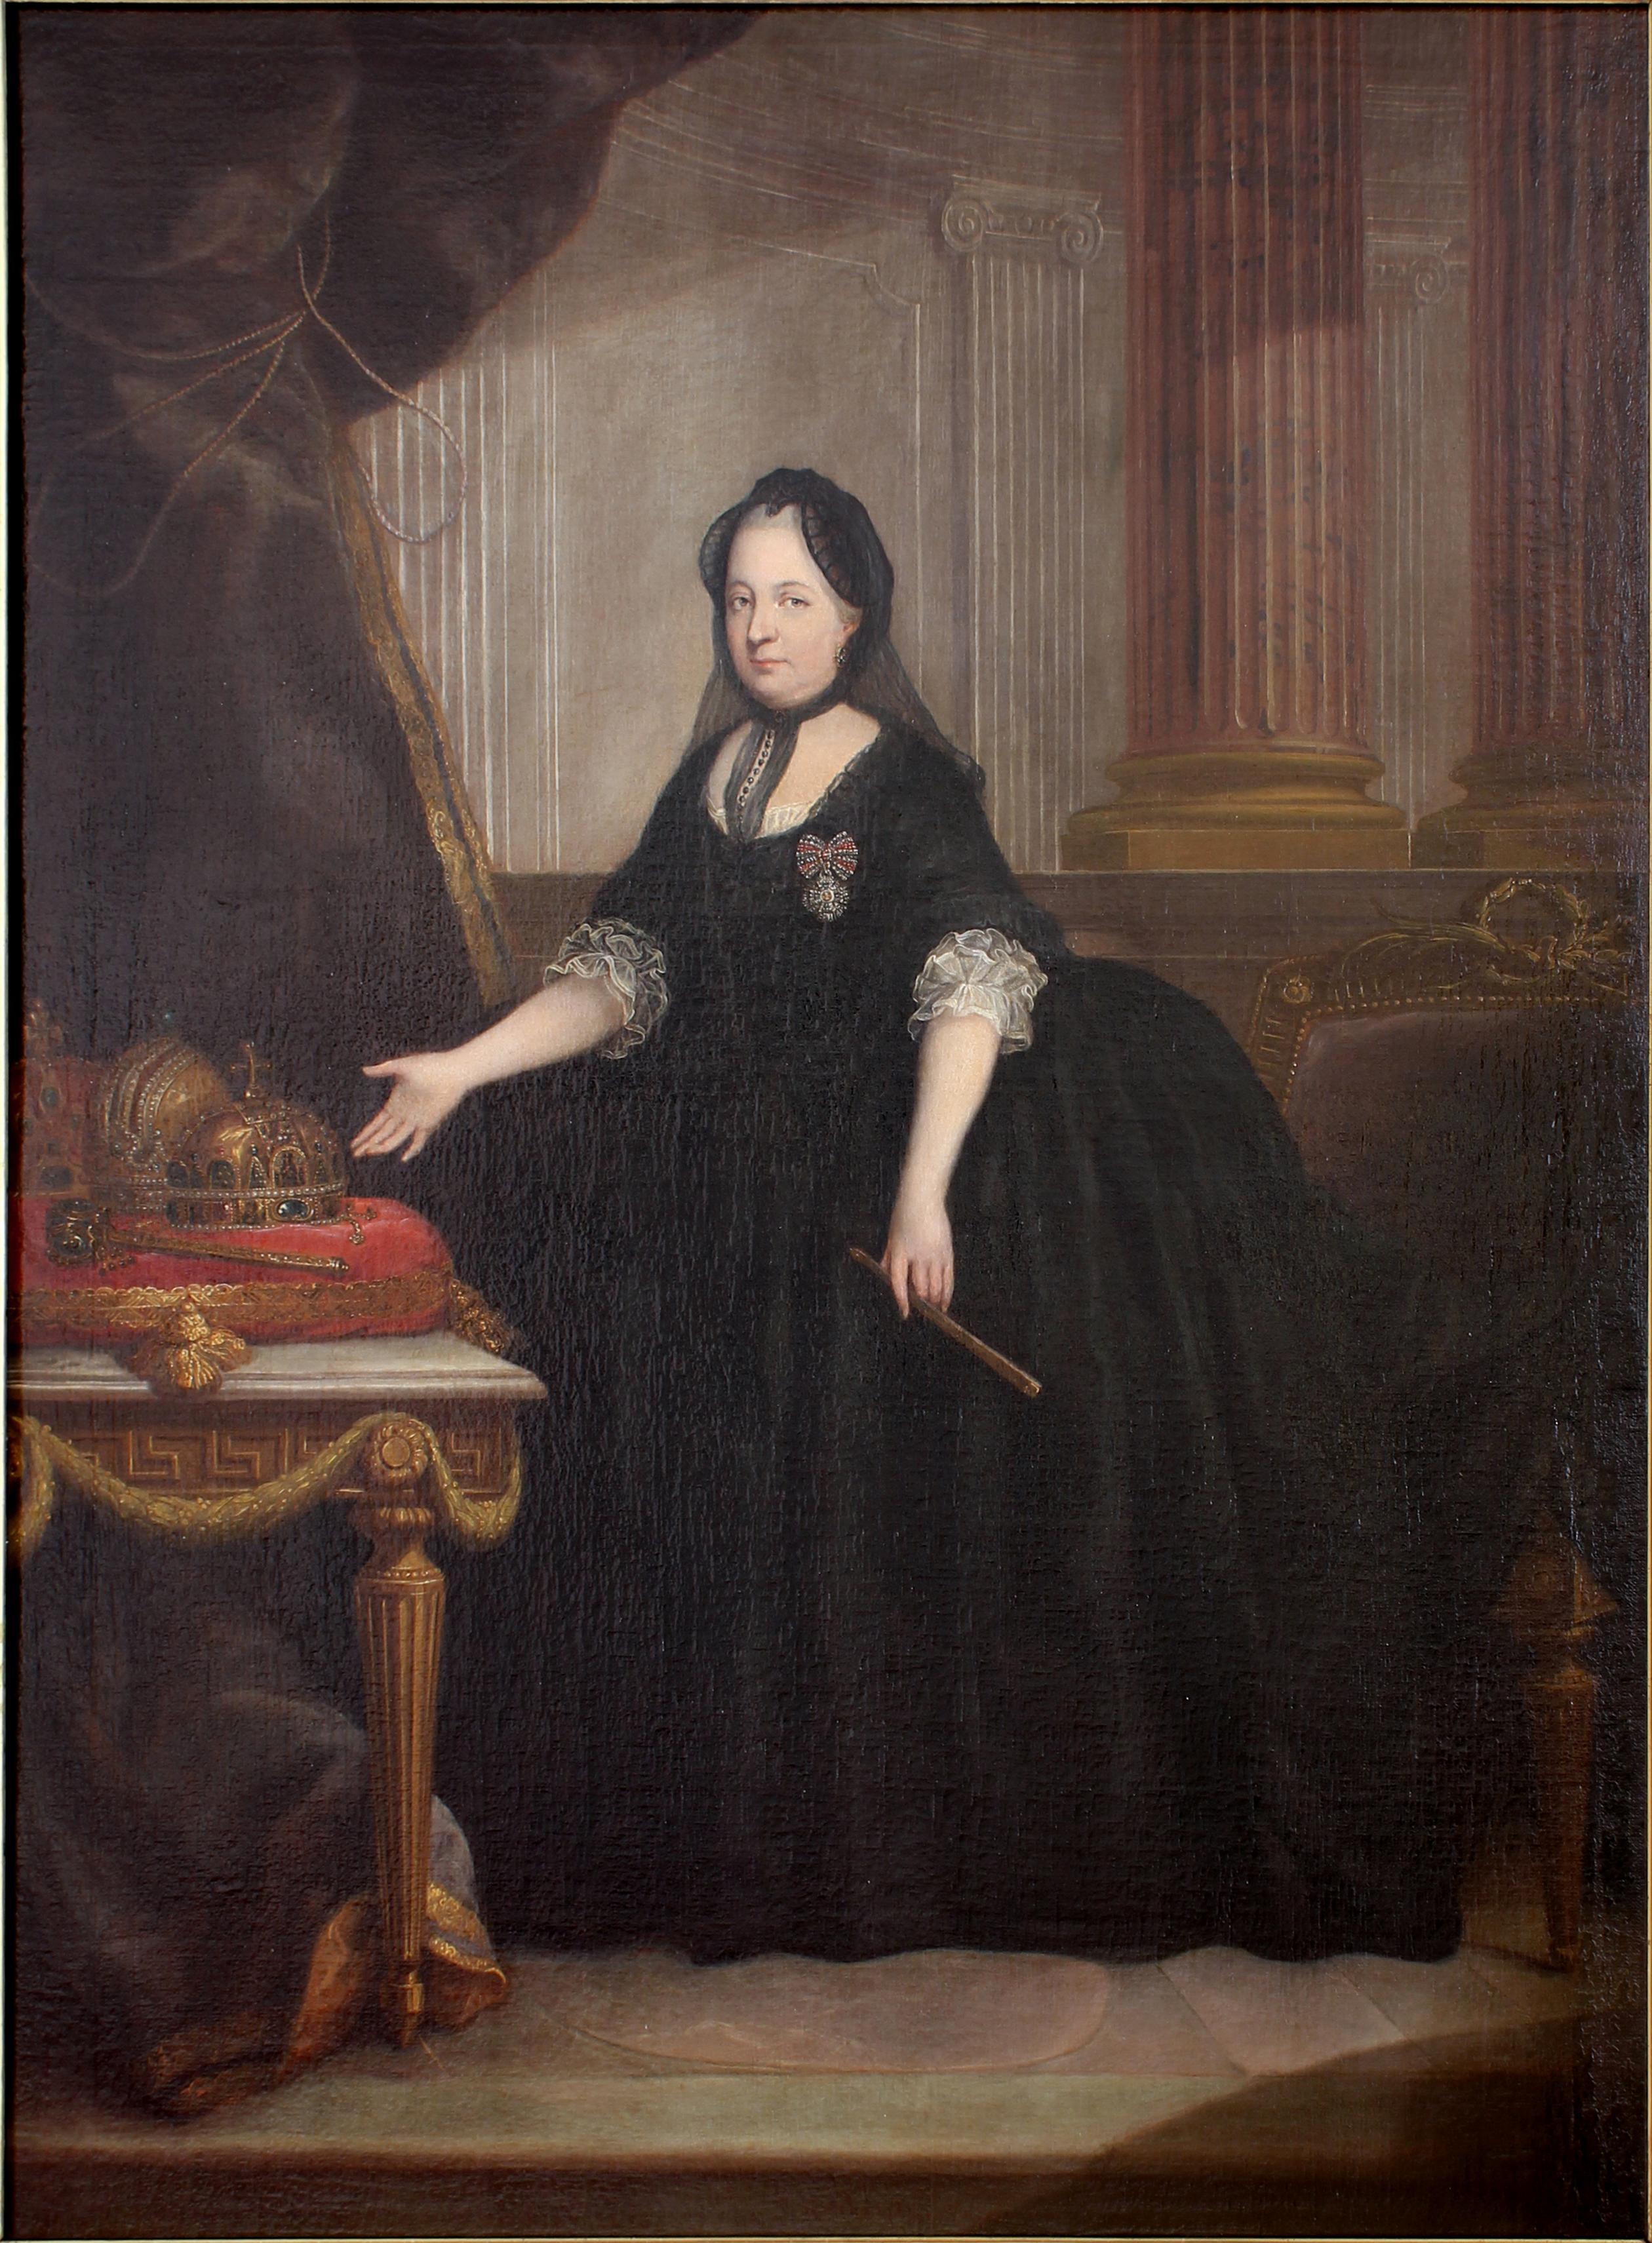 http://upload.wikimedia.org/wikipedia/commons/2/21/Marie-Th%C3%A9r%C3%A8se_d%27Autriche_(1717-1780),_atelier_d%27Anton_von_Maron.jpg